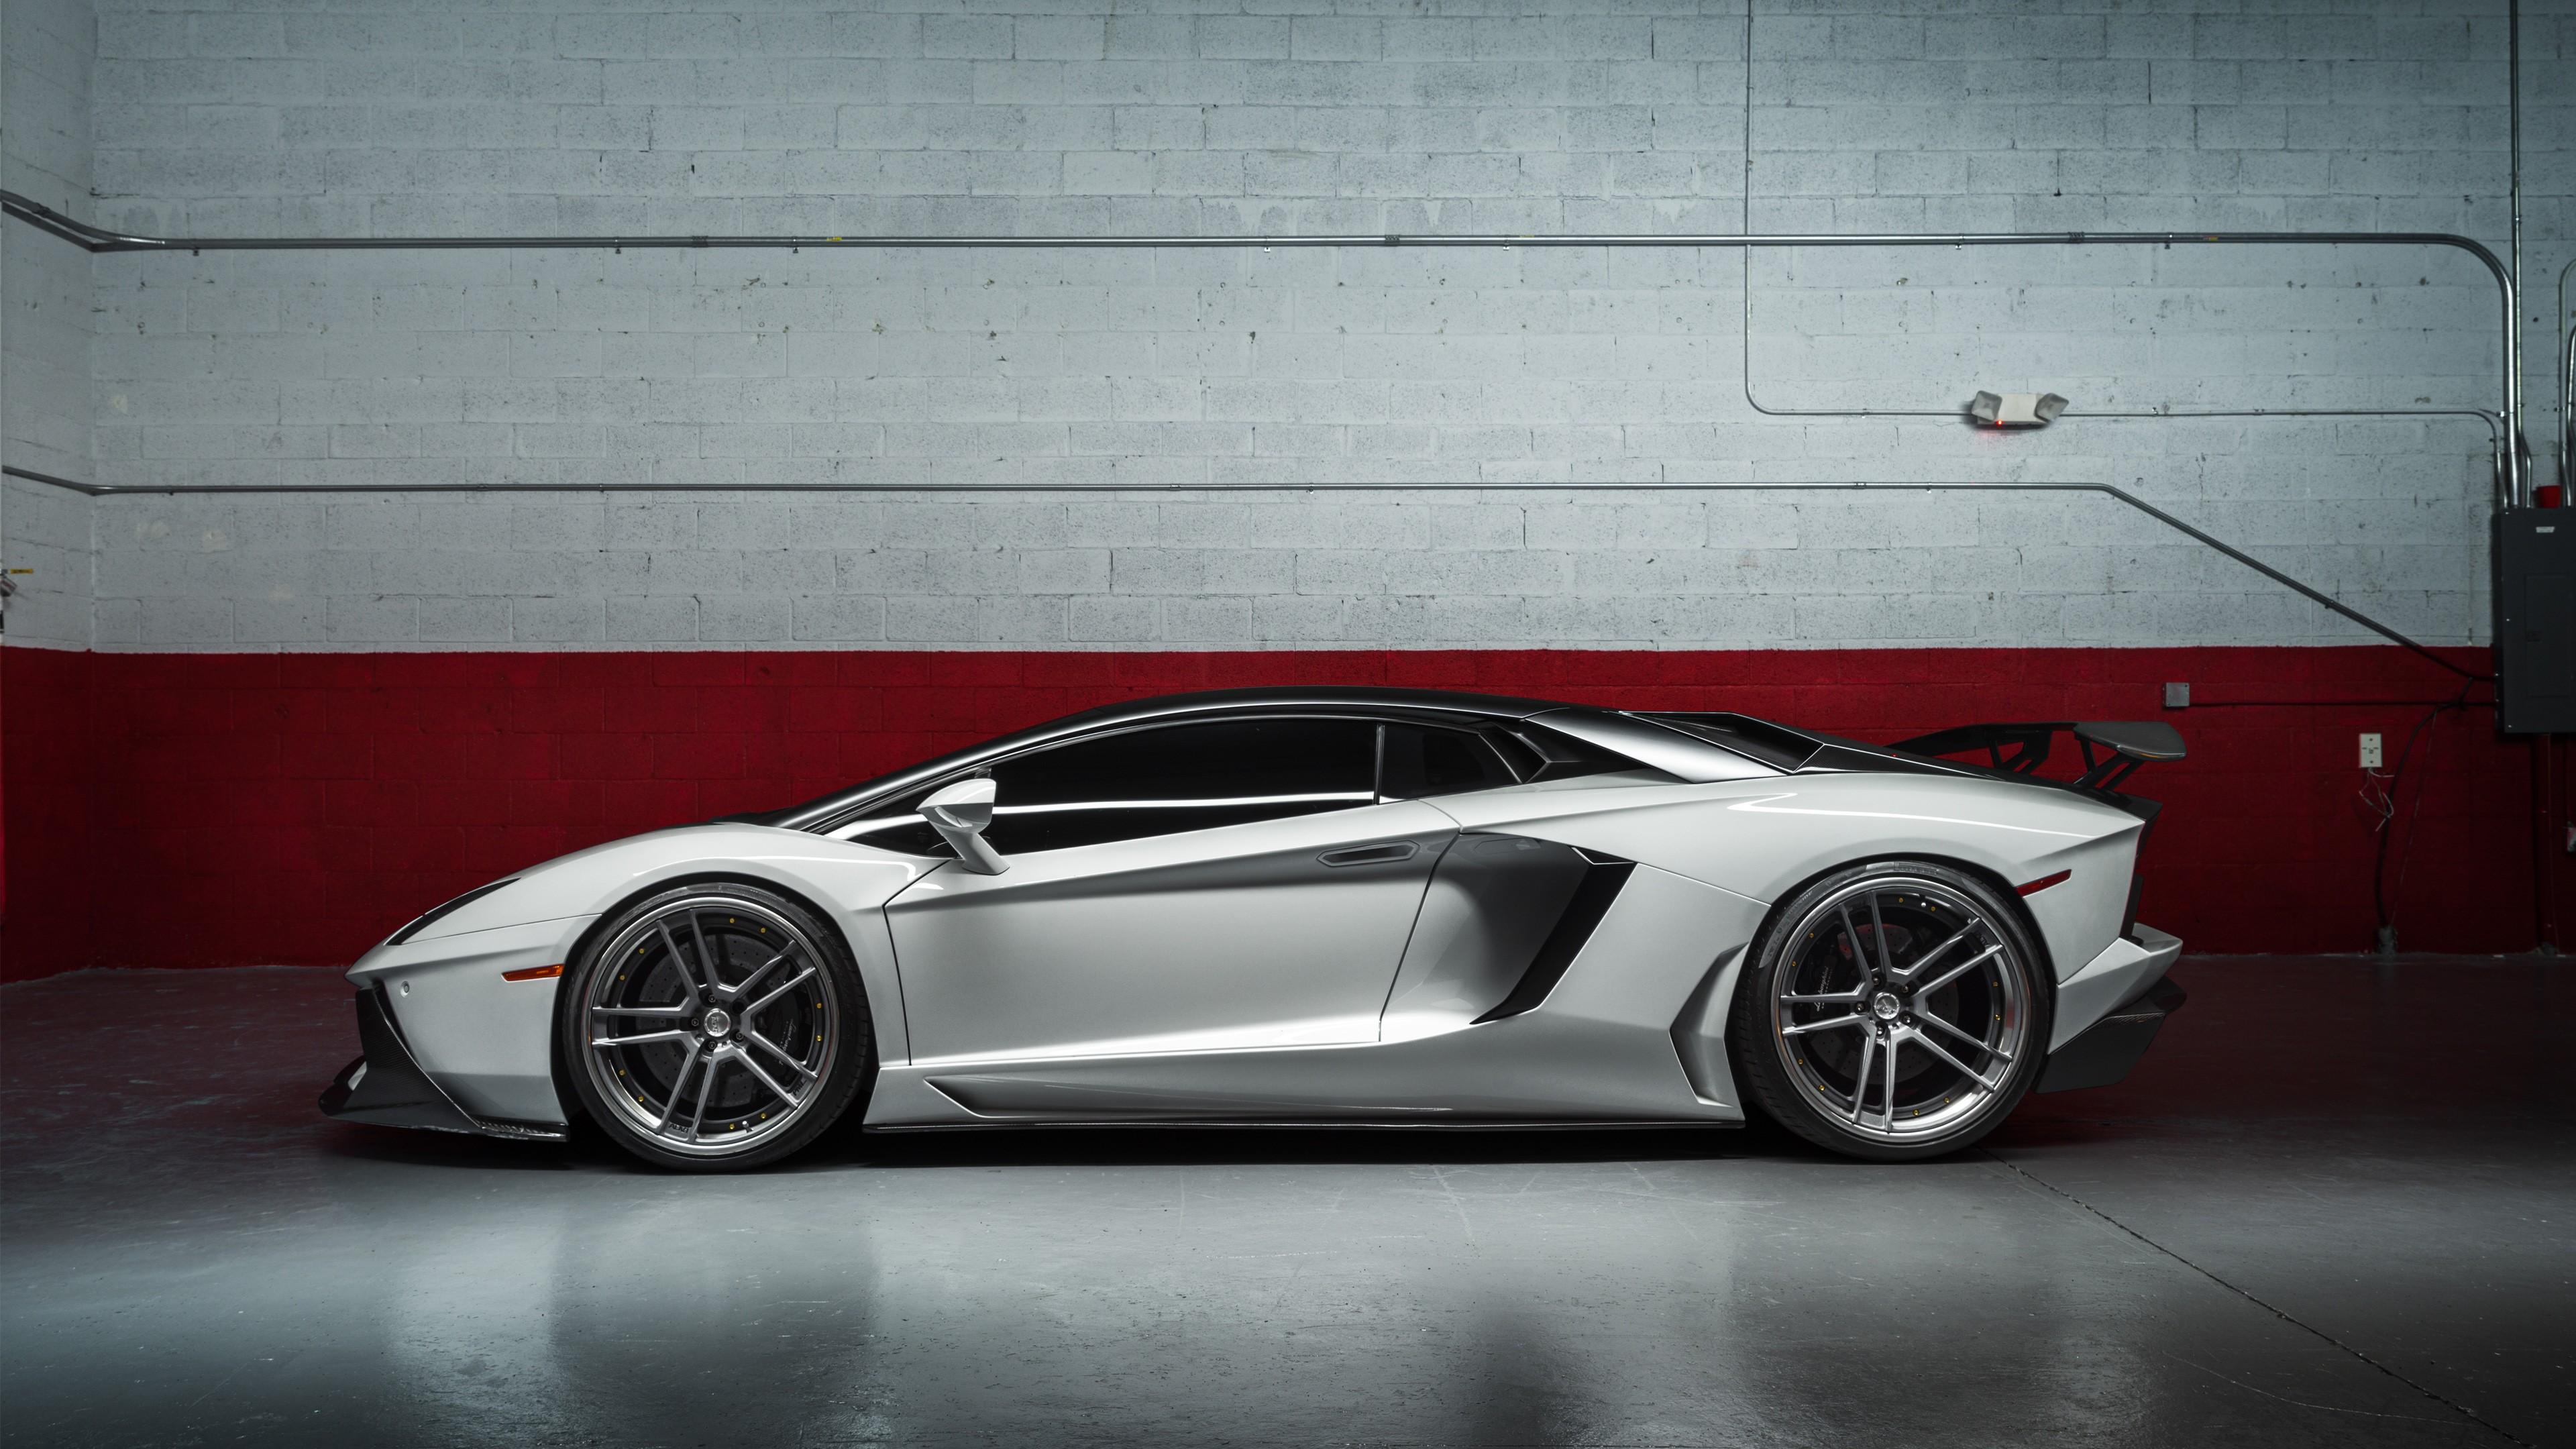 Adv1 Lamborghini Aventador Lp 4k Wallpaper Hd Car Wallpapers Id 6327